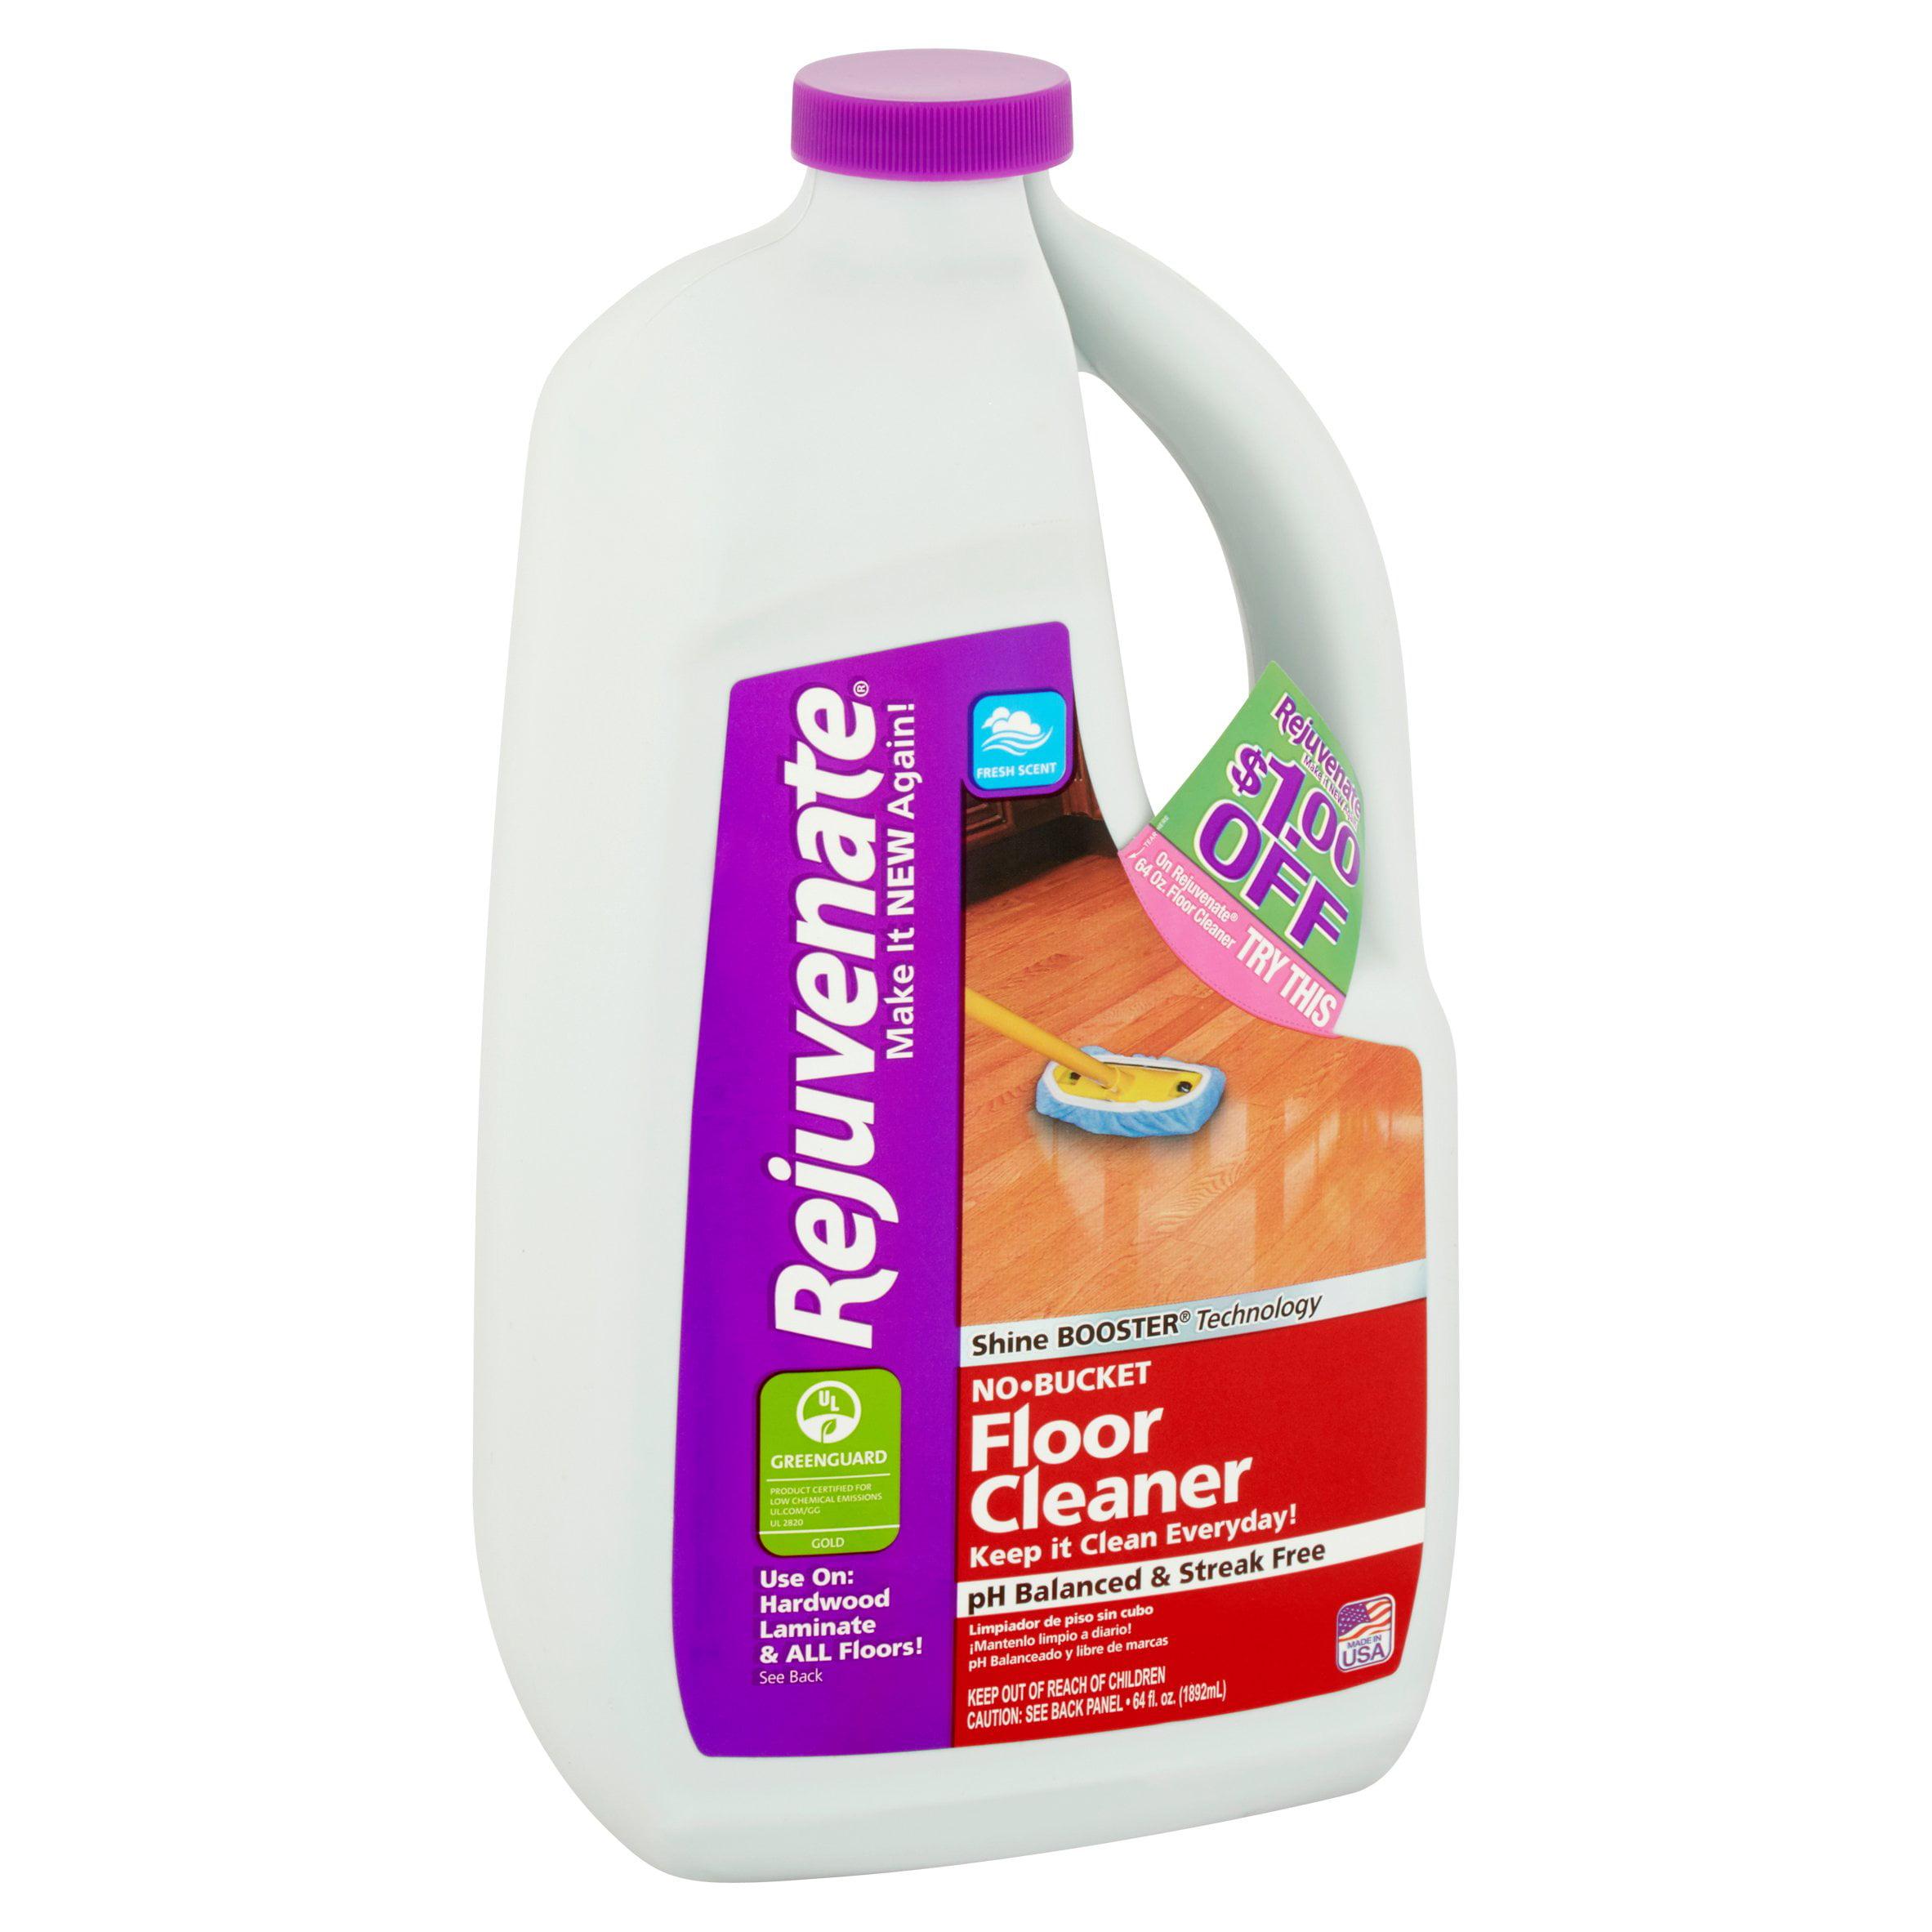 competitive price 59b6d 5d7b2 Rejuvenate Fresh Scent No-Bucket Floor Cleaner, 64 fl oz - Walmart.com